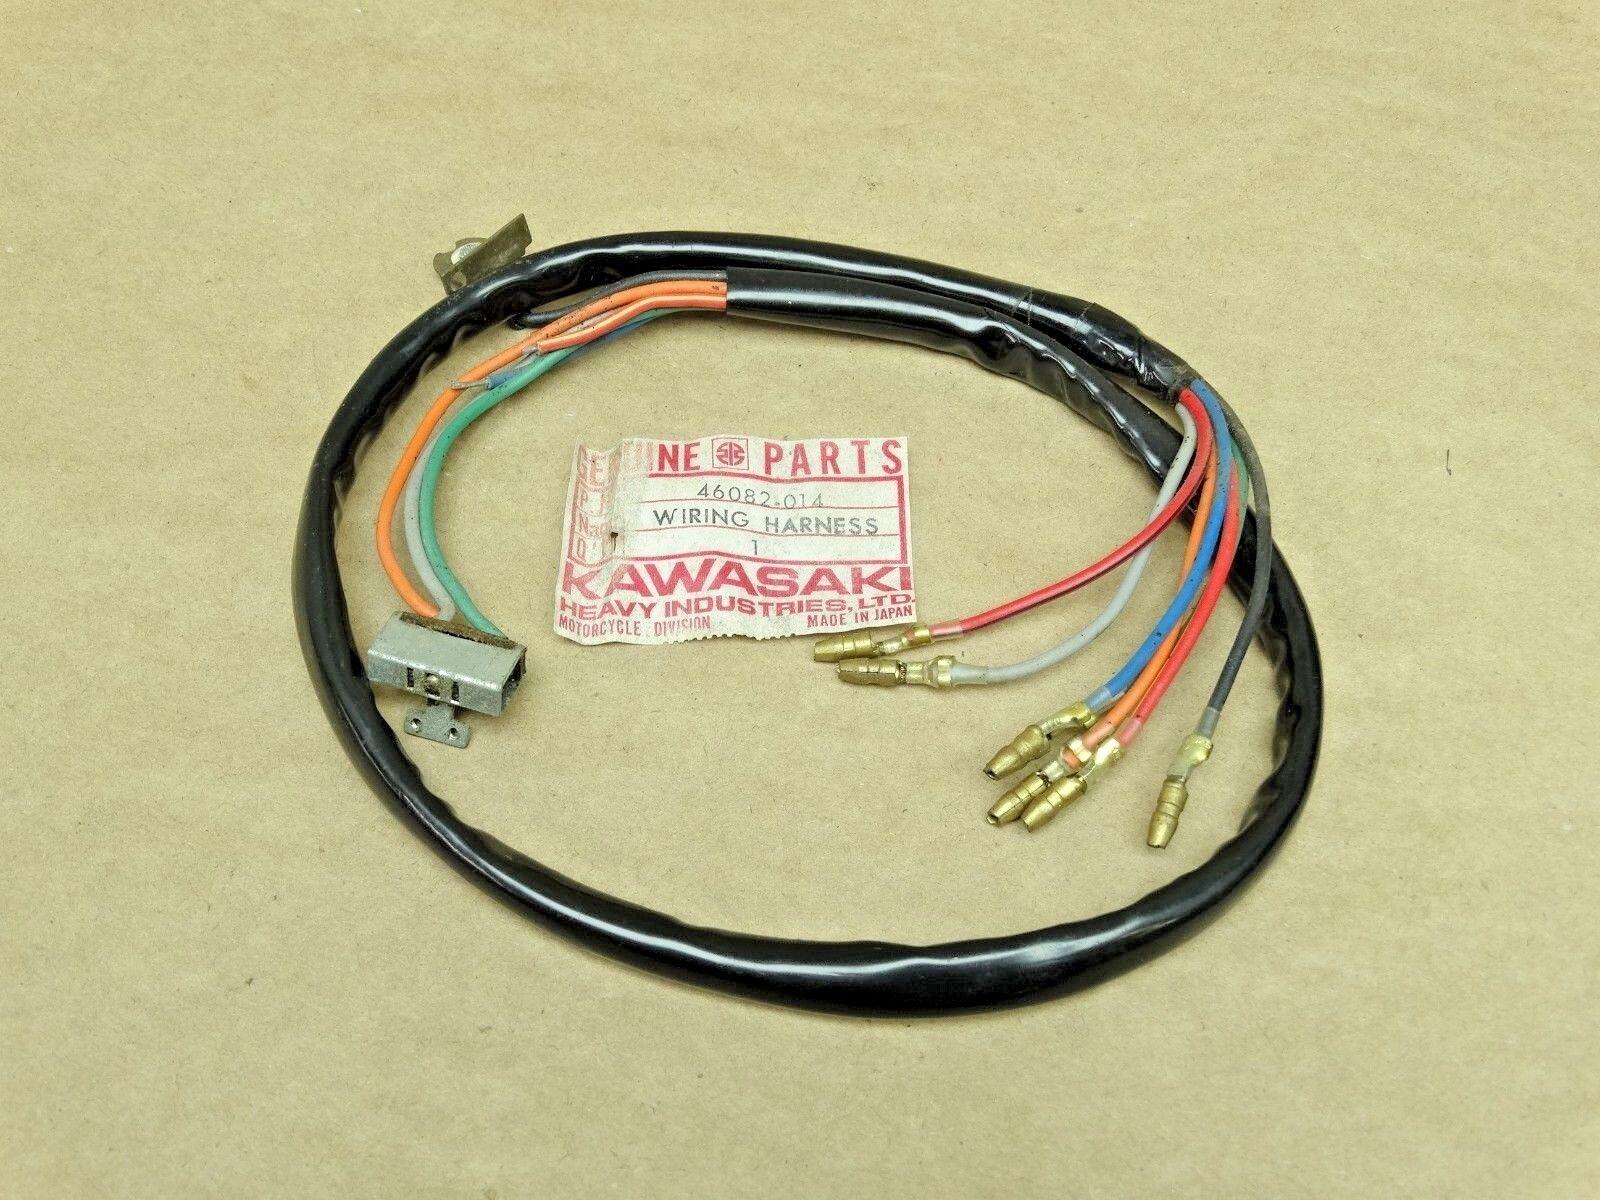 Kawasaki Nos Left Handlebar Switch Wire Harness H1 Kh500 Mach Iii Kh Wiring For 500 H 1 Ebay